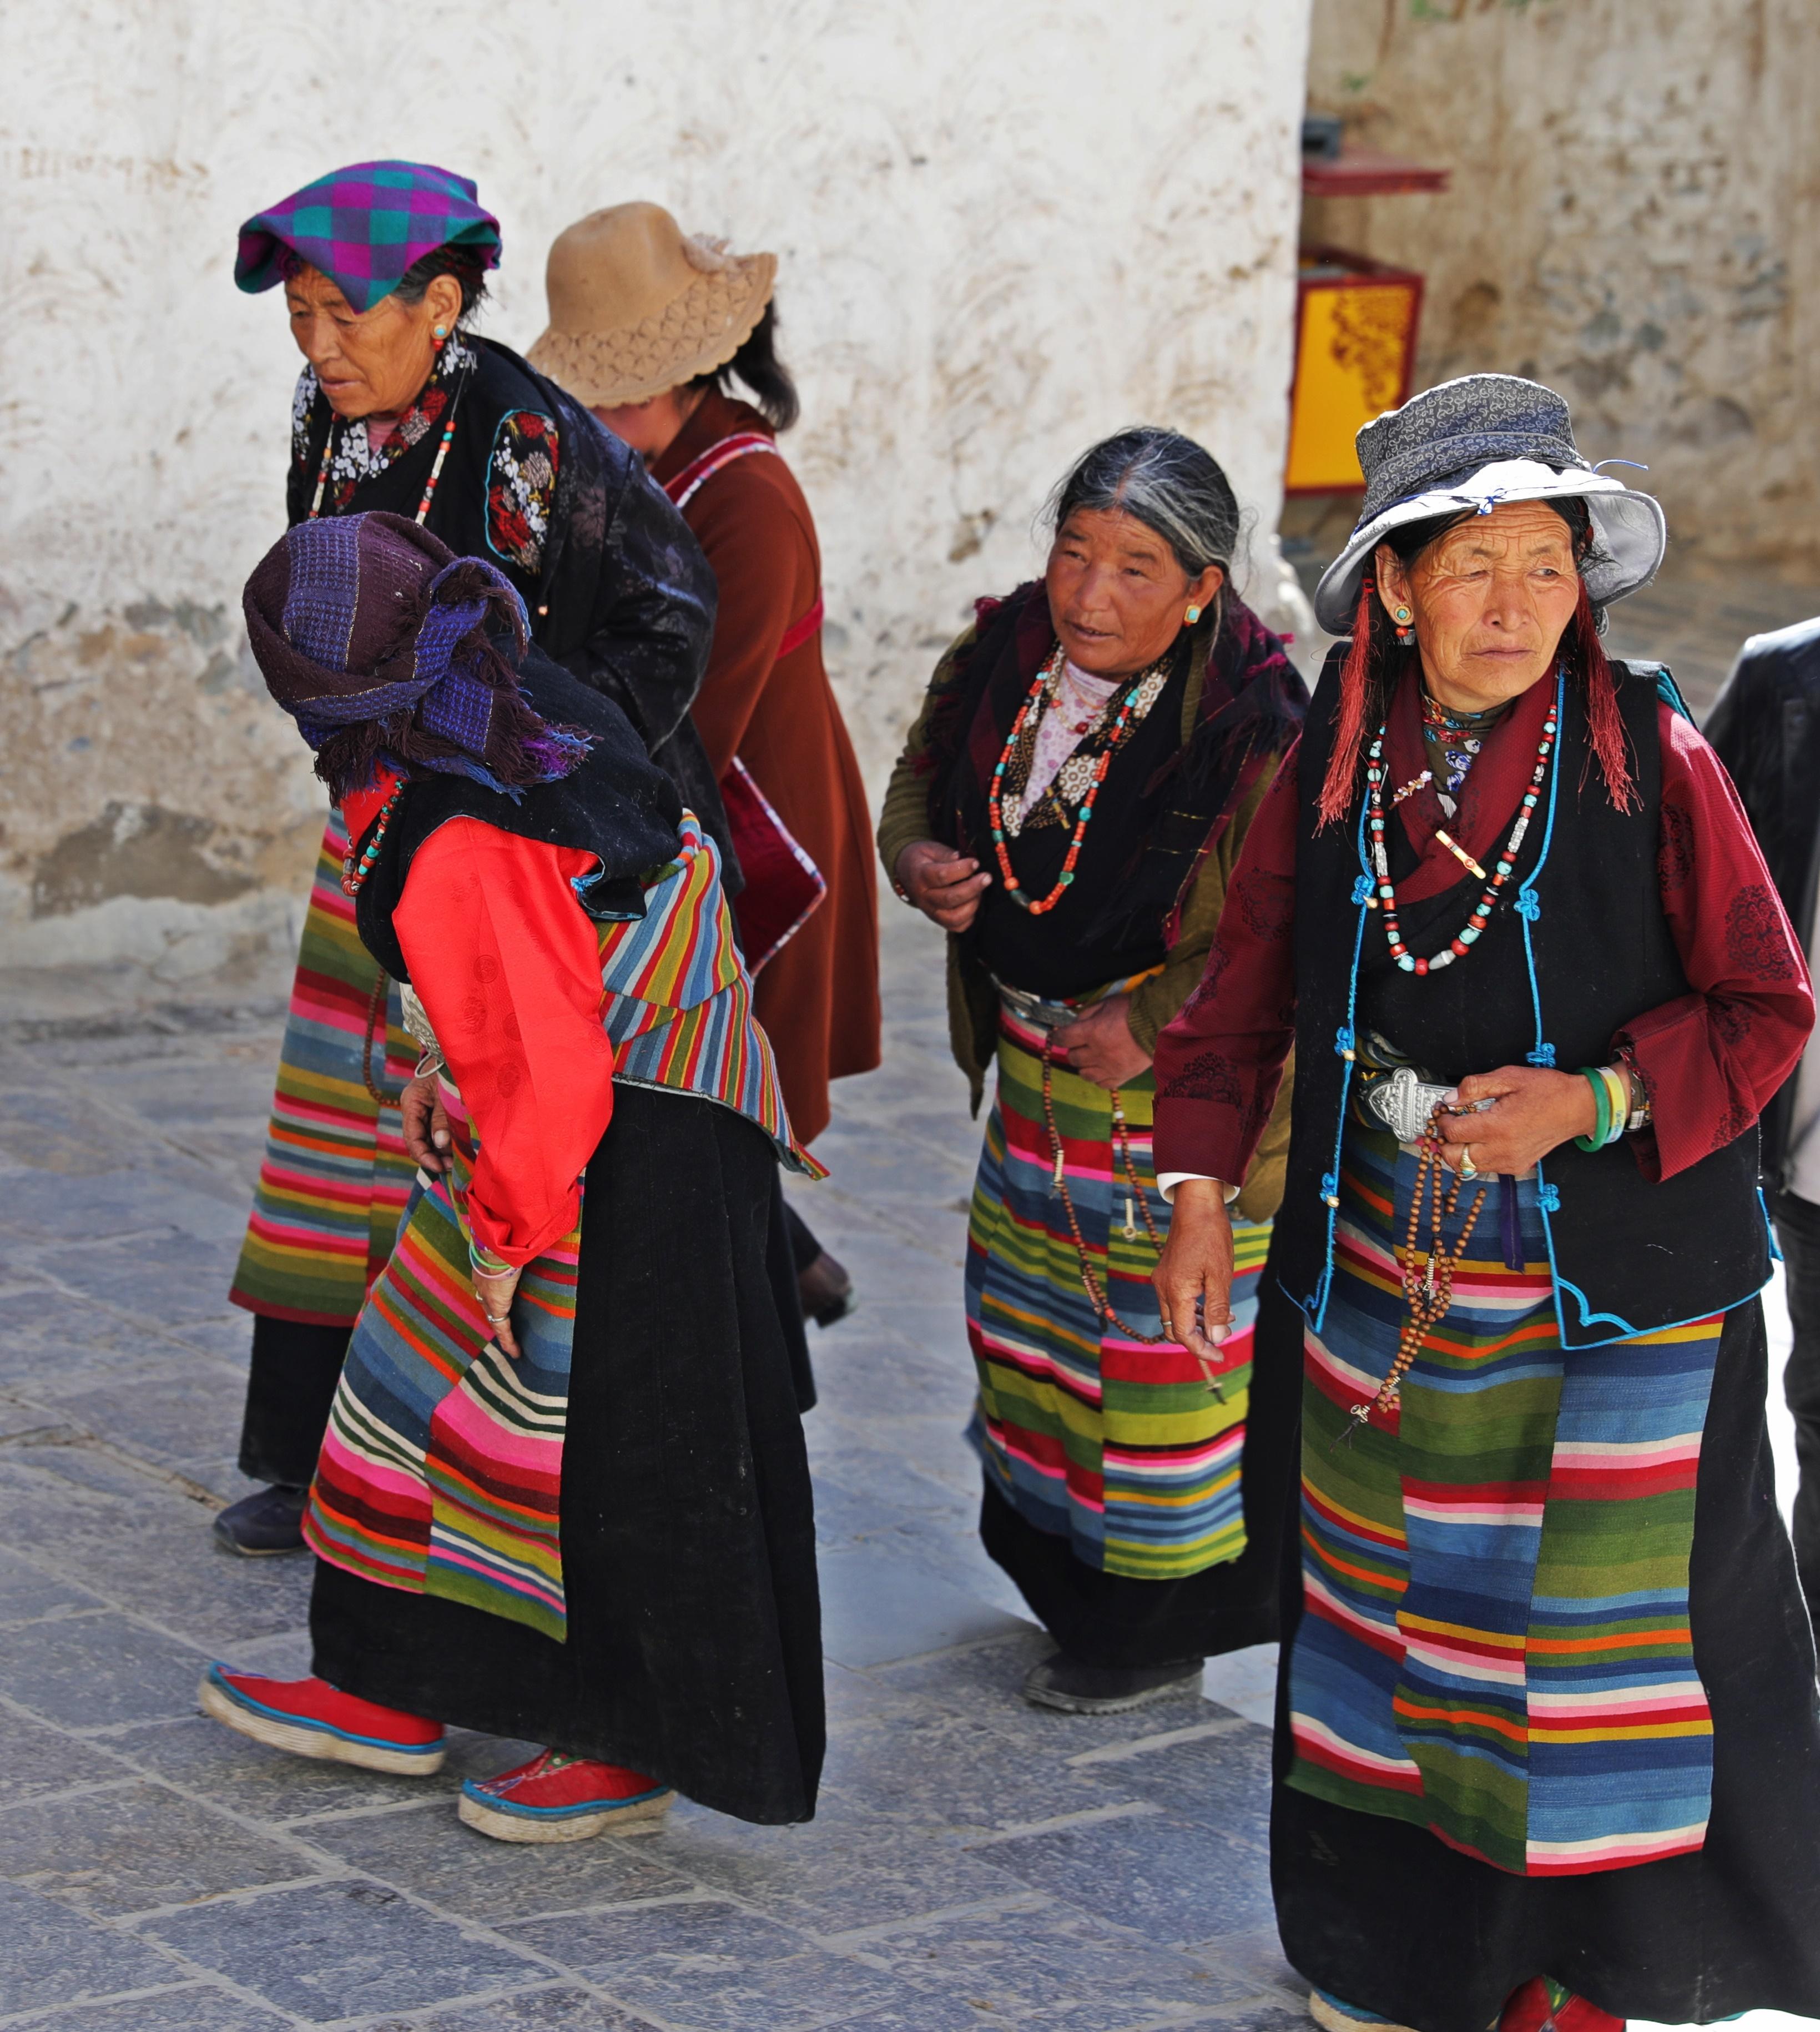 Pilgrims at Tashi Lhunpo Gompa